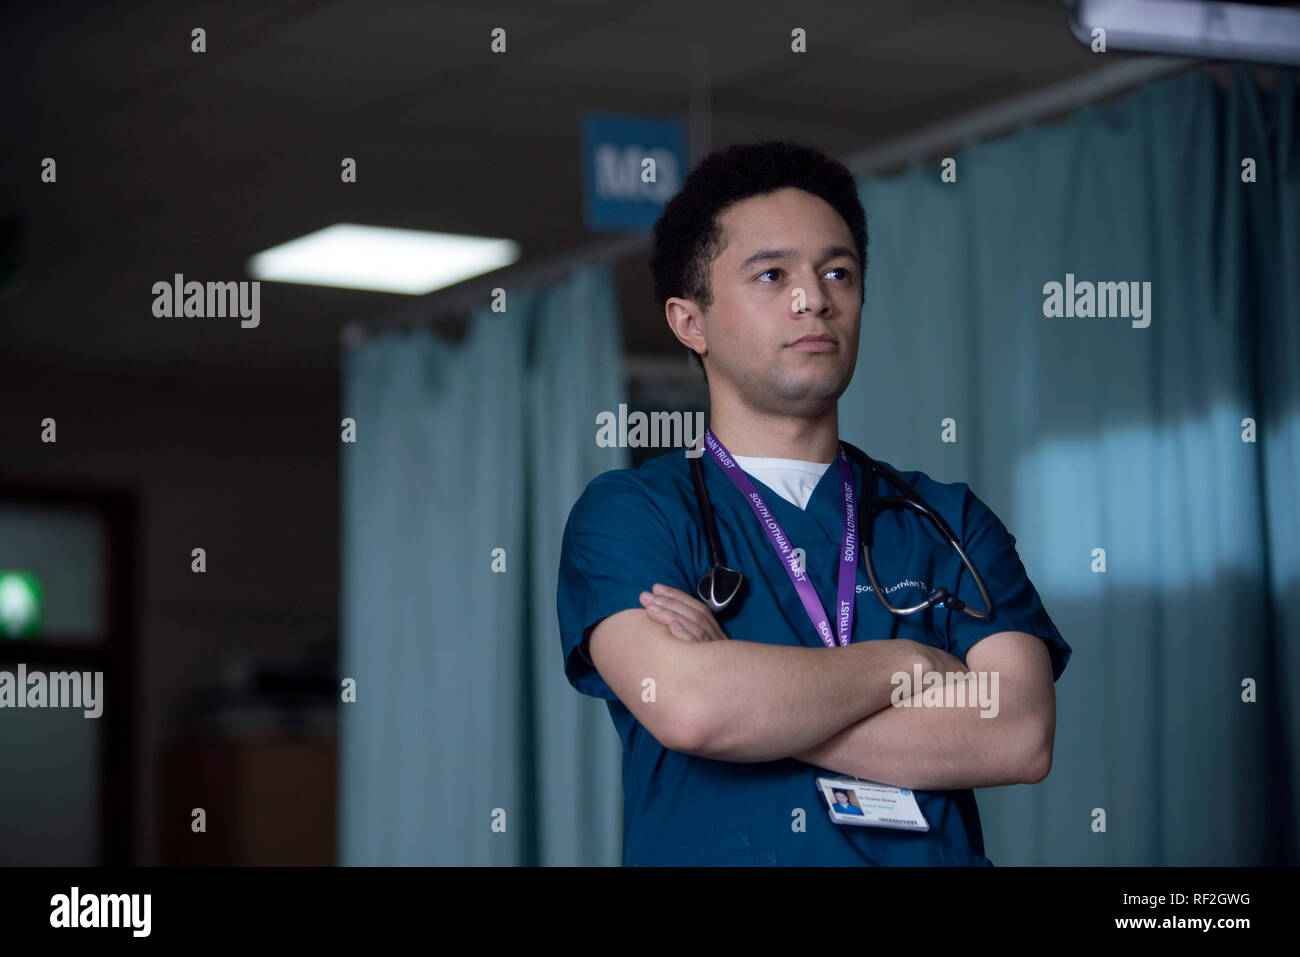 Prod DB © Mark Mainz - BBC One - Red Production Company / DR SECRET MEDICAL TRUST ME mini serie TV creee par Dan Sefton 2017- GB saison 1 episode 3 Michael Abubakar. chirurgien; docteur; surgeon; doctor - Stock Image